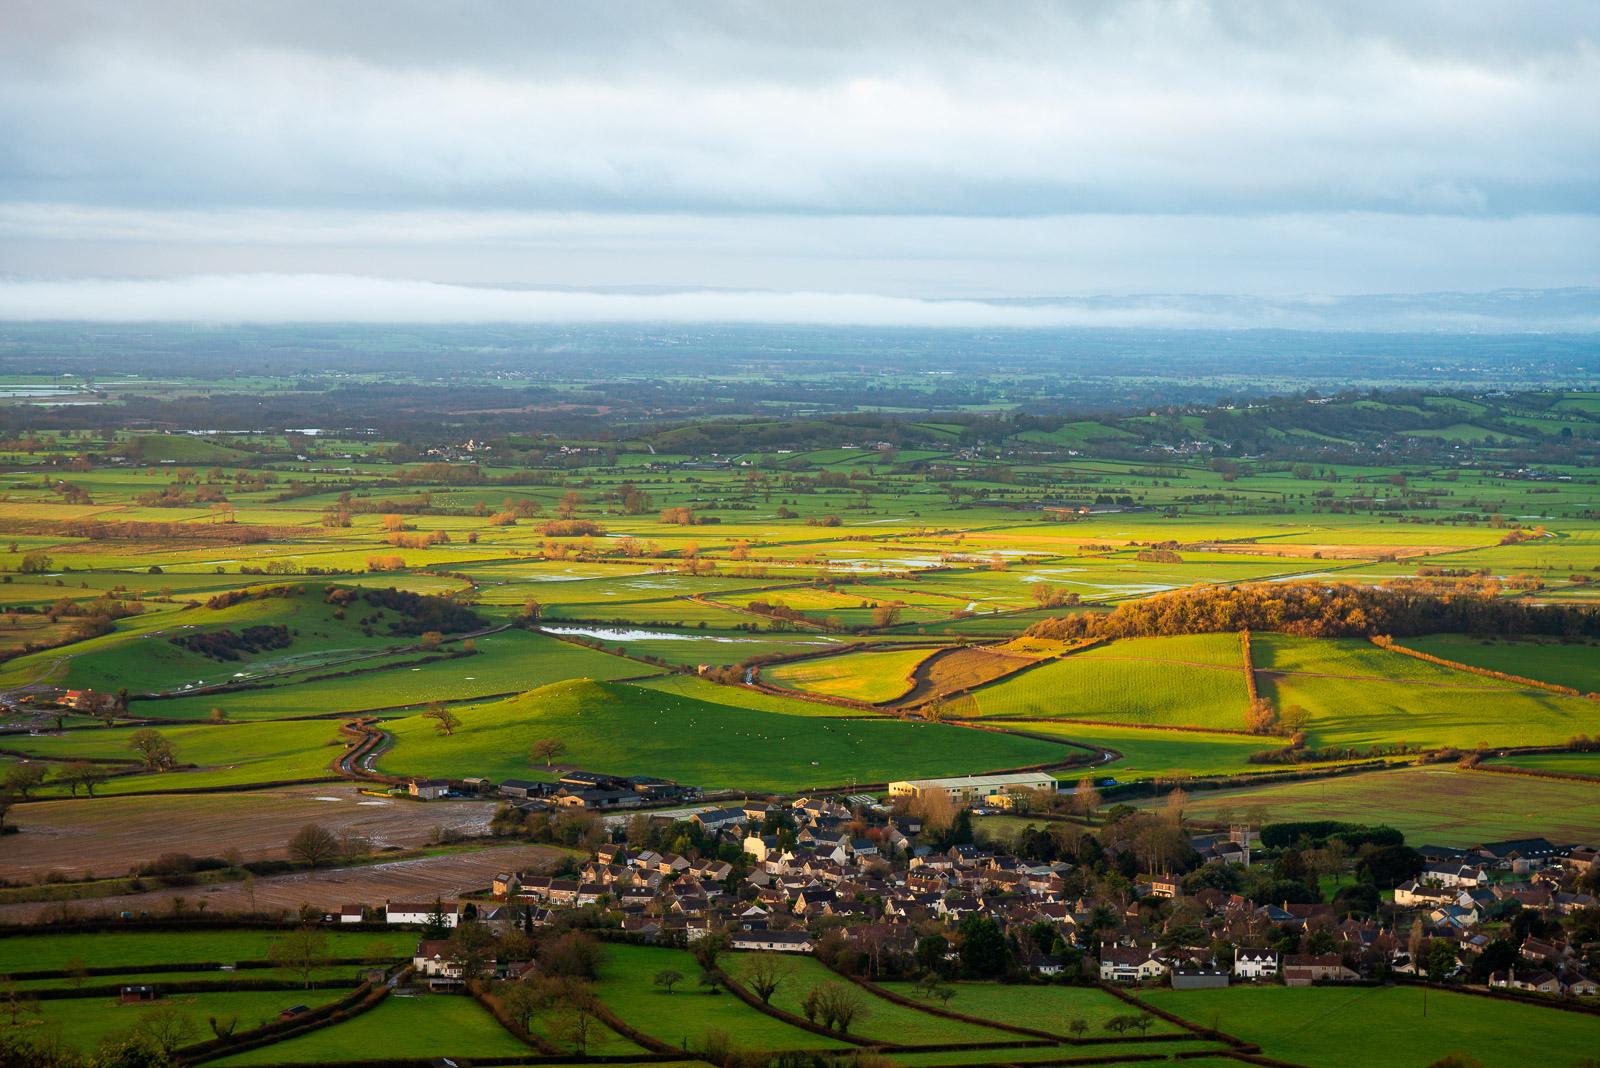 Westbury-sub-Mendip - From Cooks Fields, Mendip Hills, Somerset, UK. ID JB1_1294